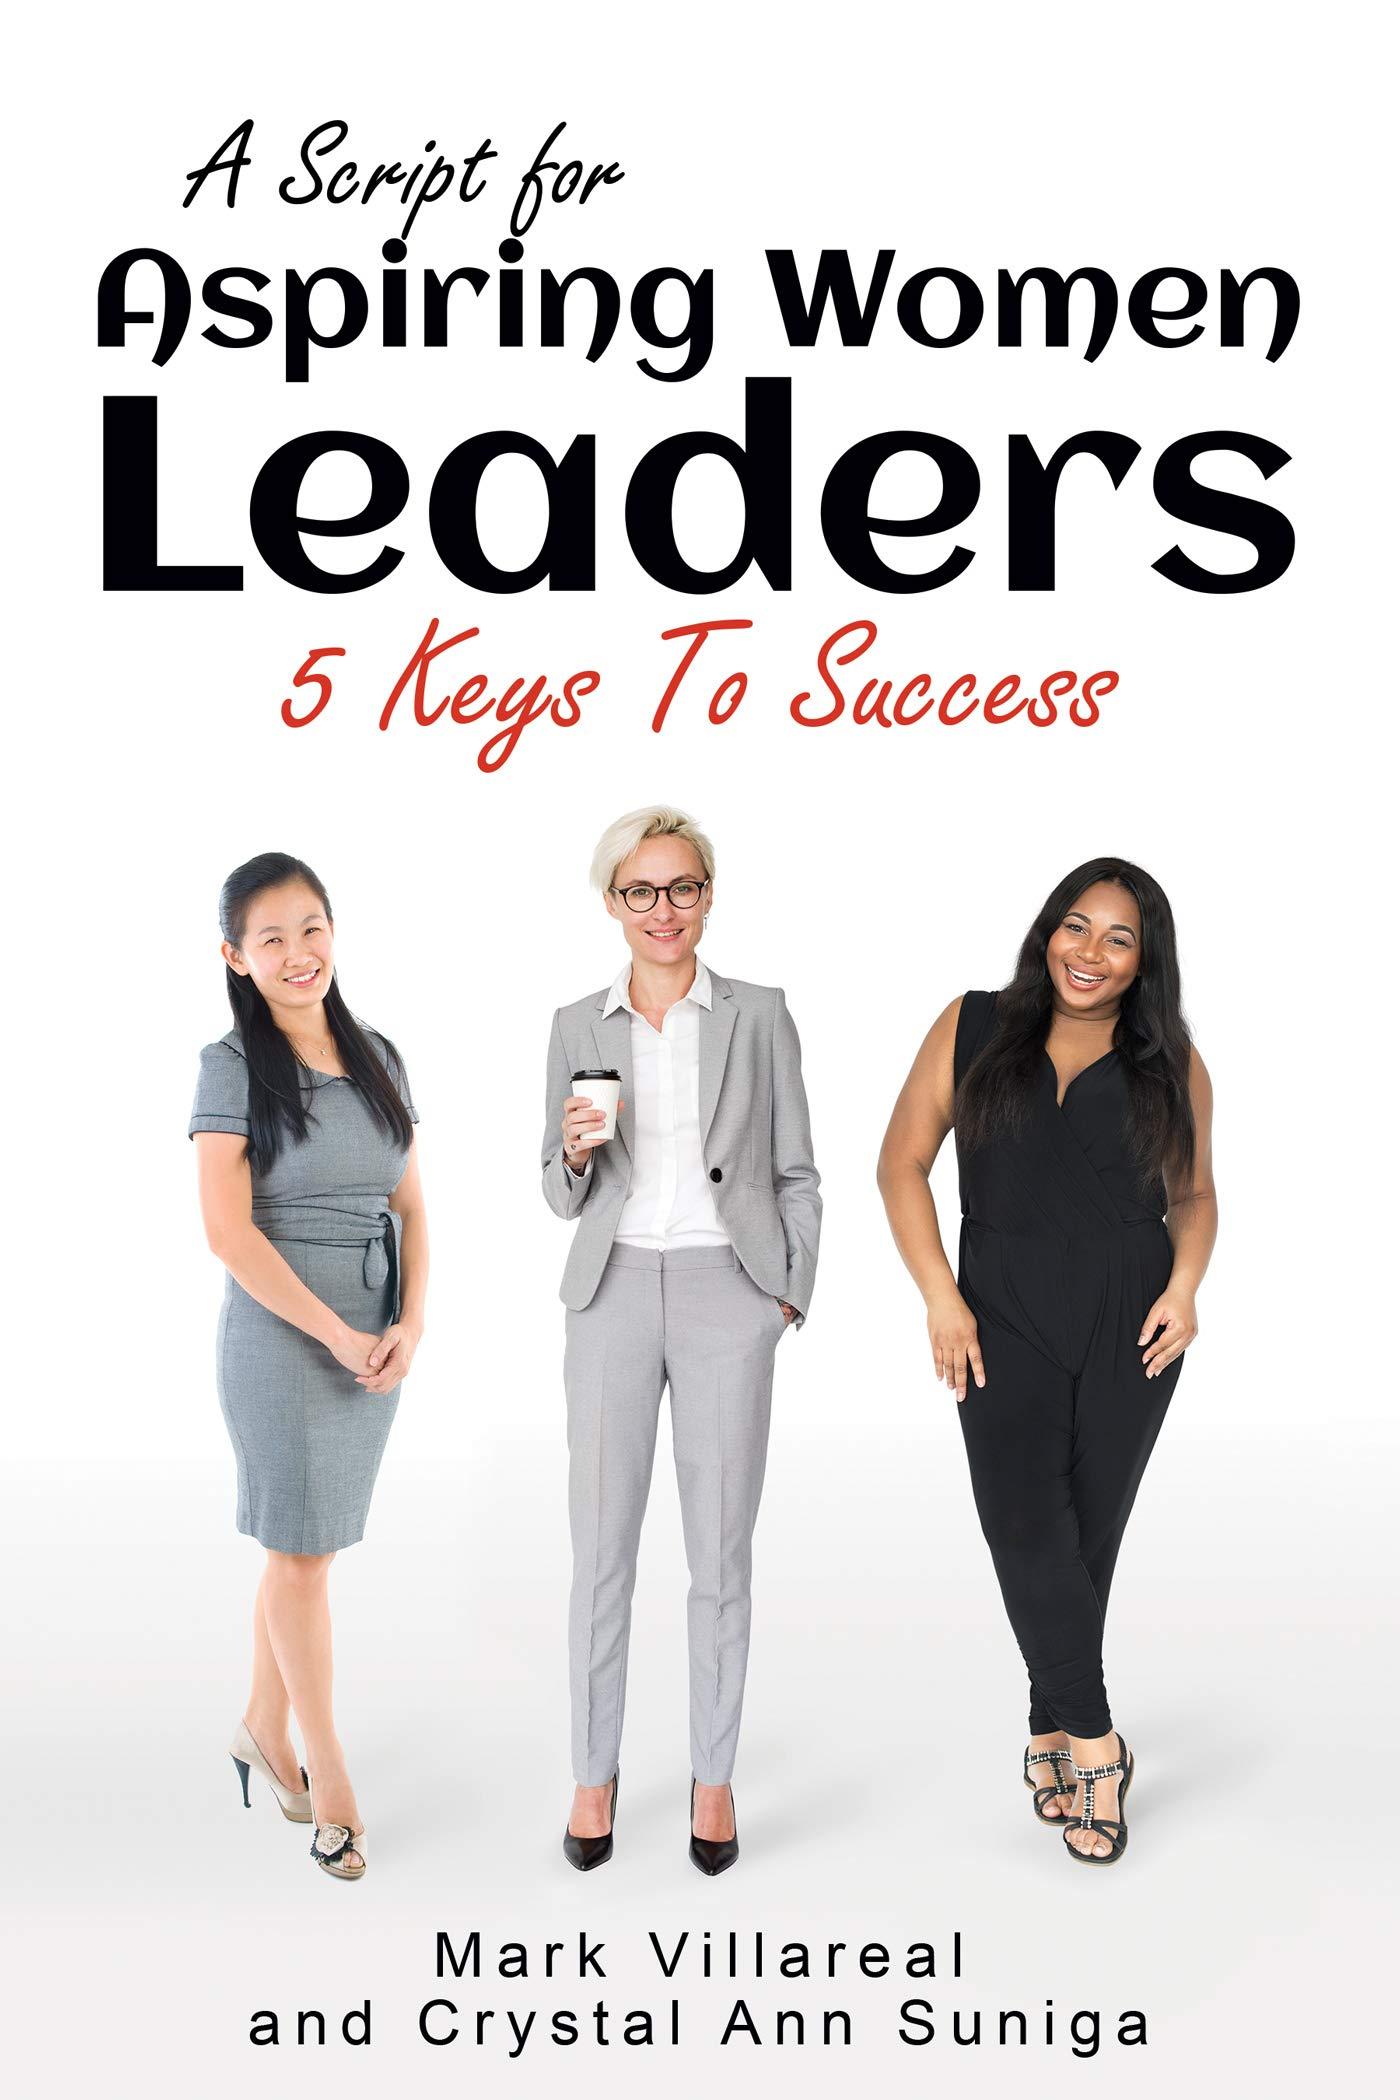 A Script for Aspiring Women Leaders: 5 Keys to Success